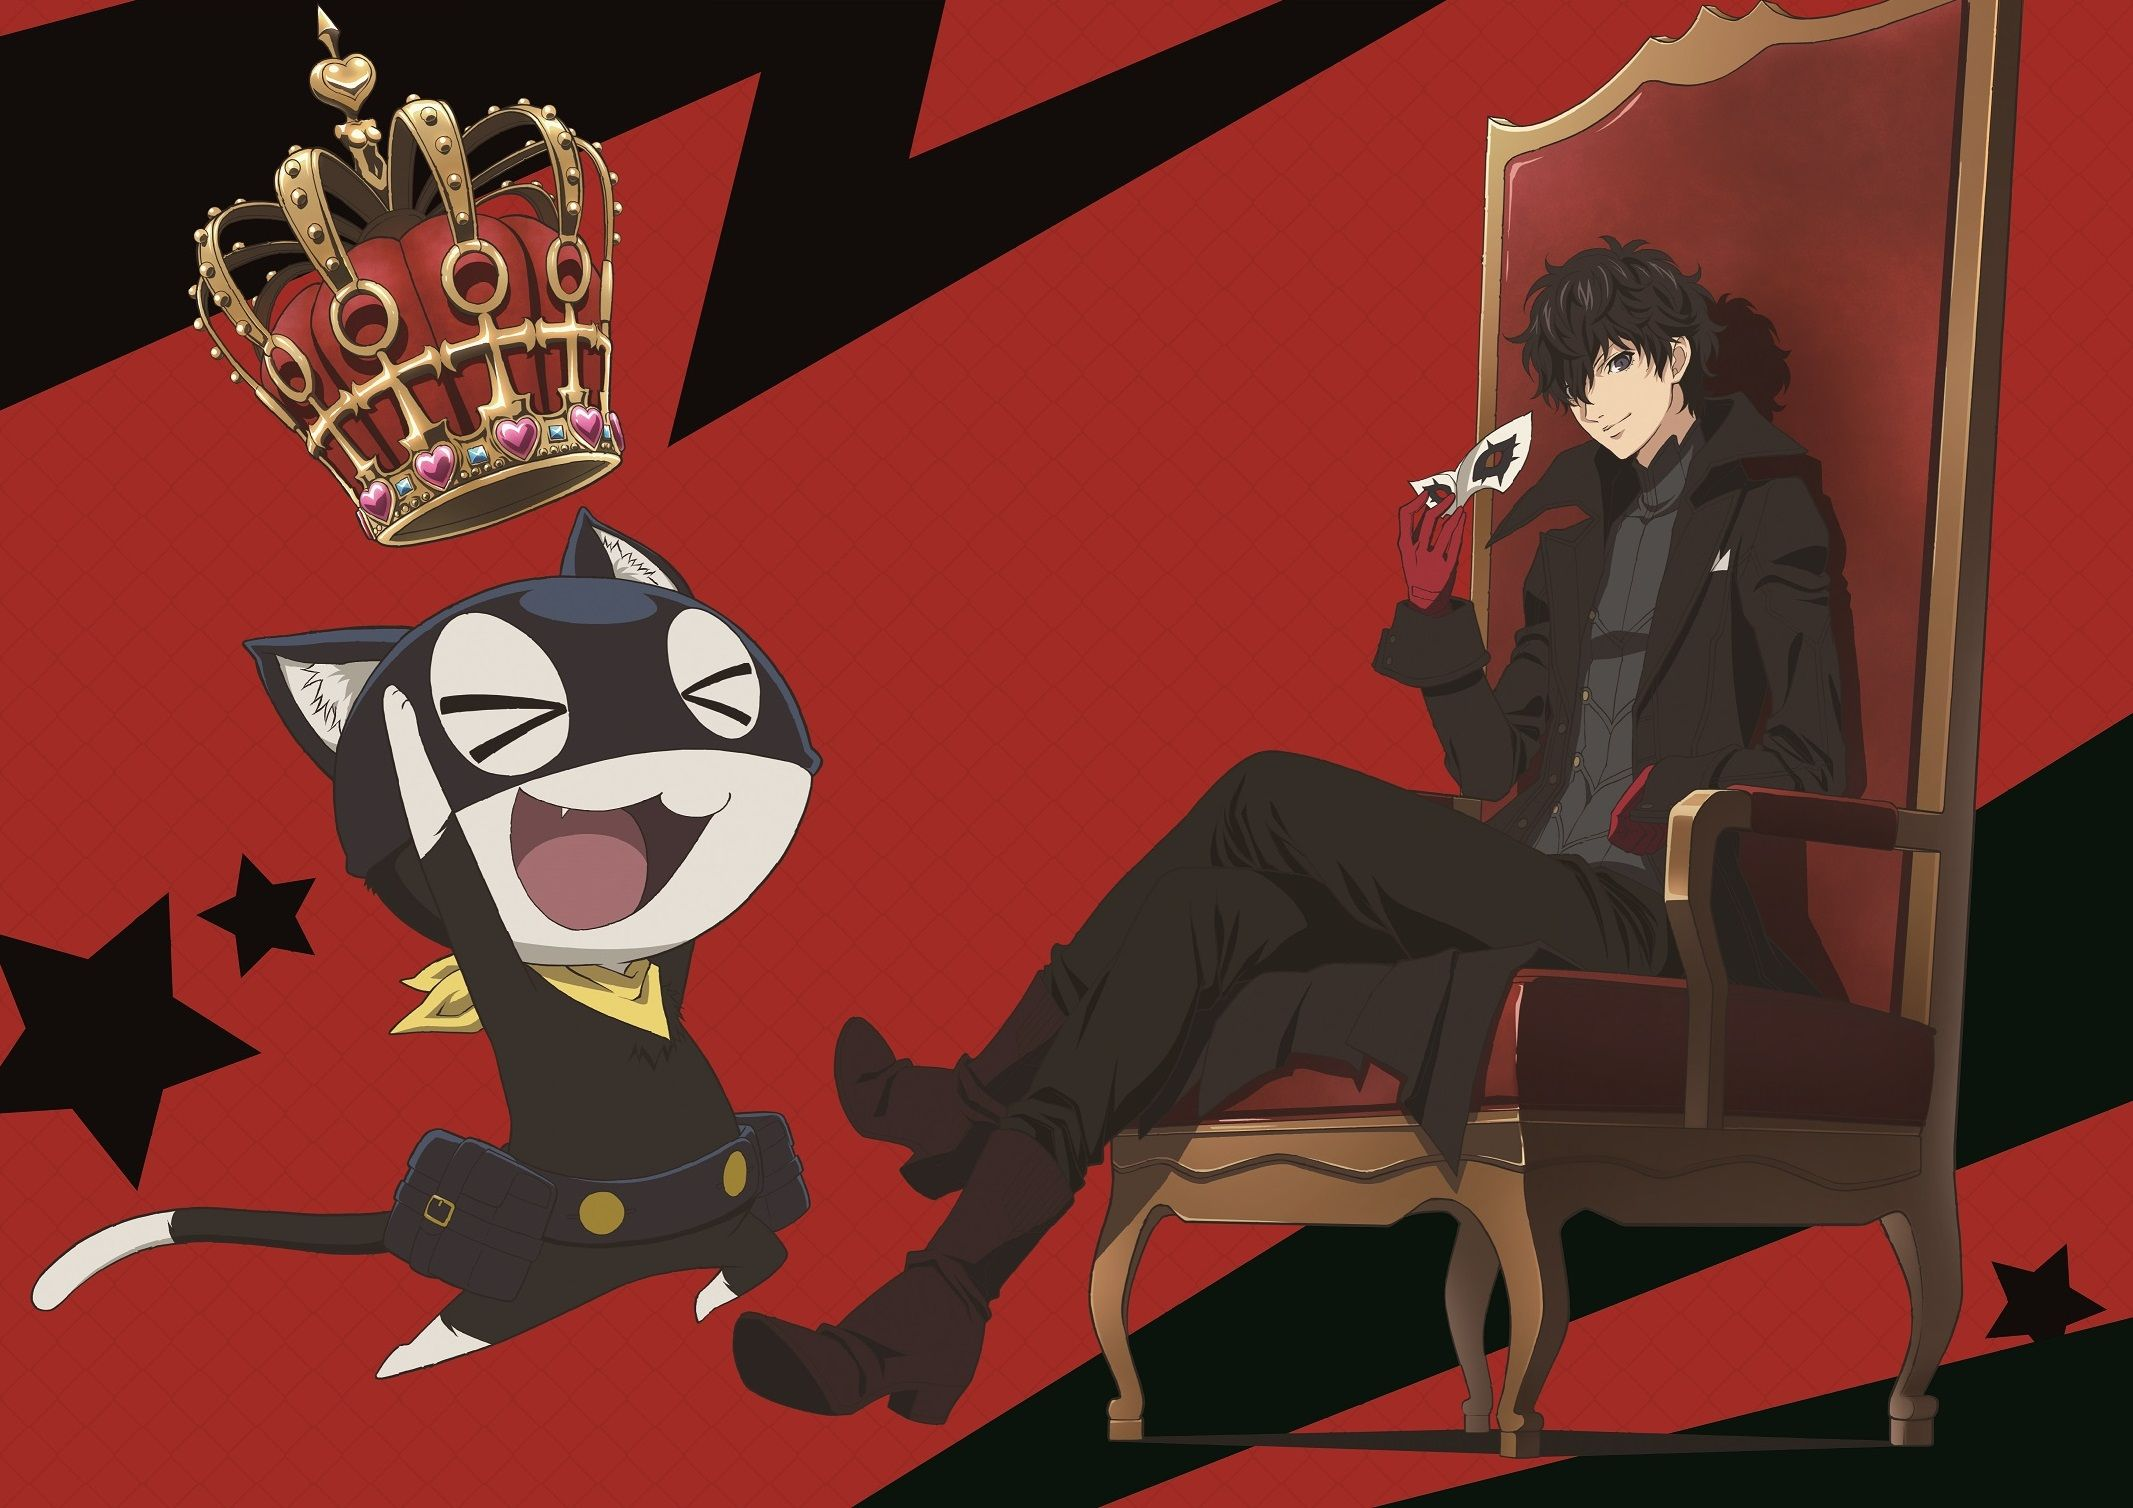 Persona 5 the Animation 2303536 Persona 5 anime